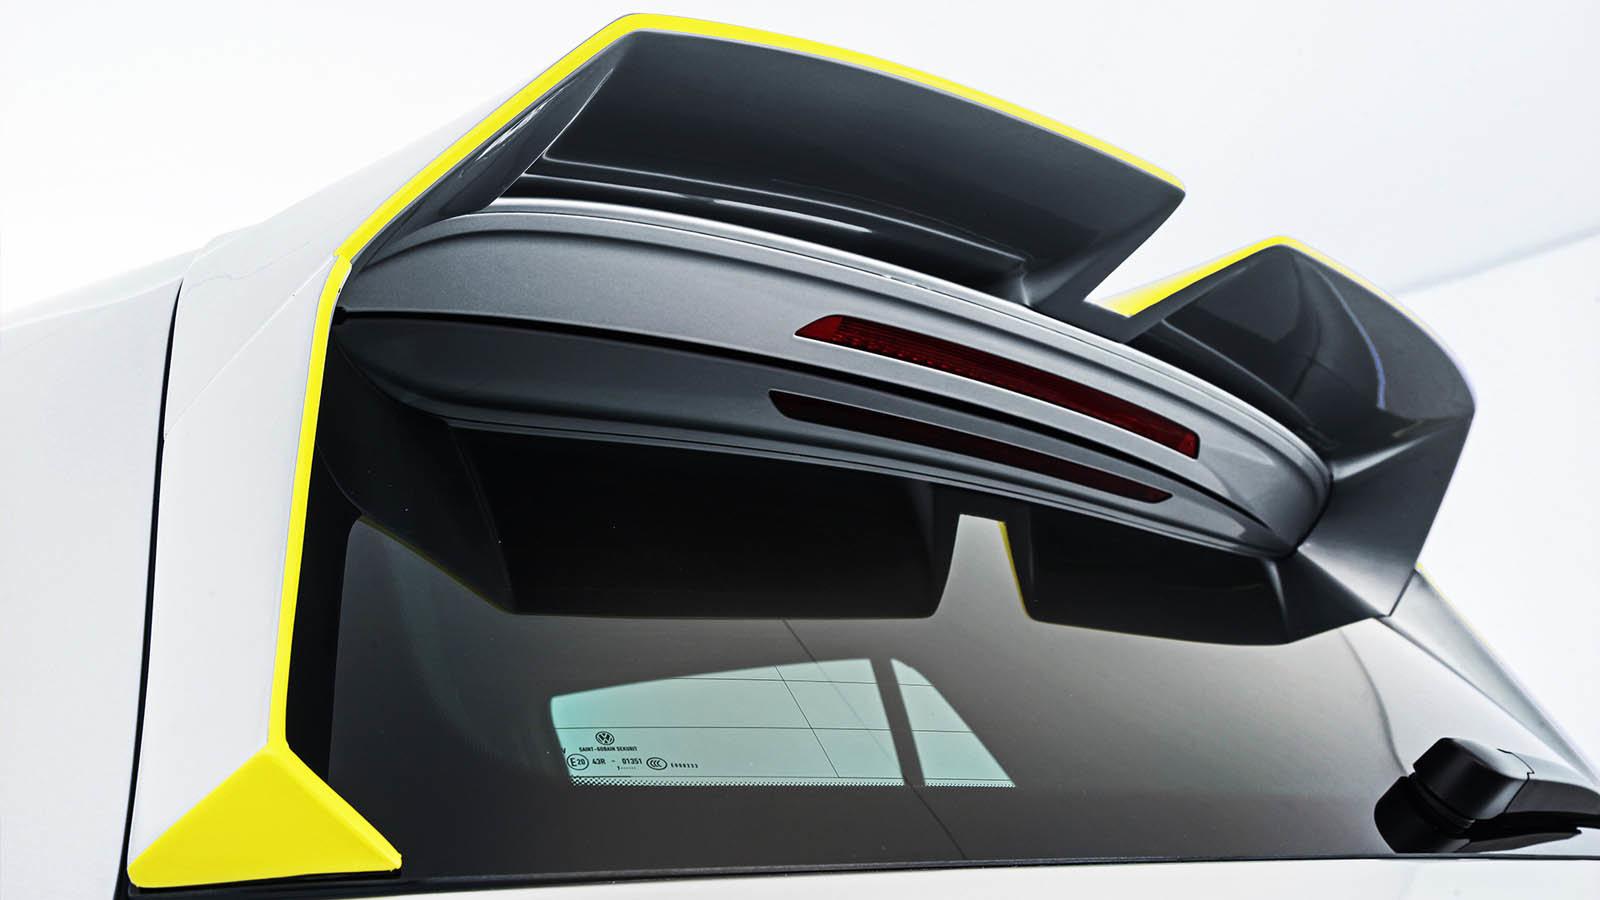 Policejní Volkswagen Golf R z dílny Oettinger